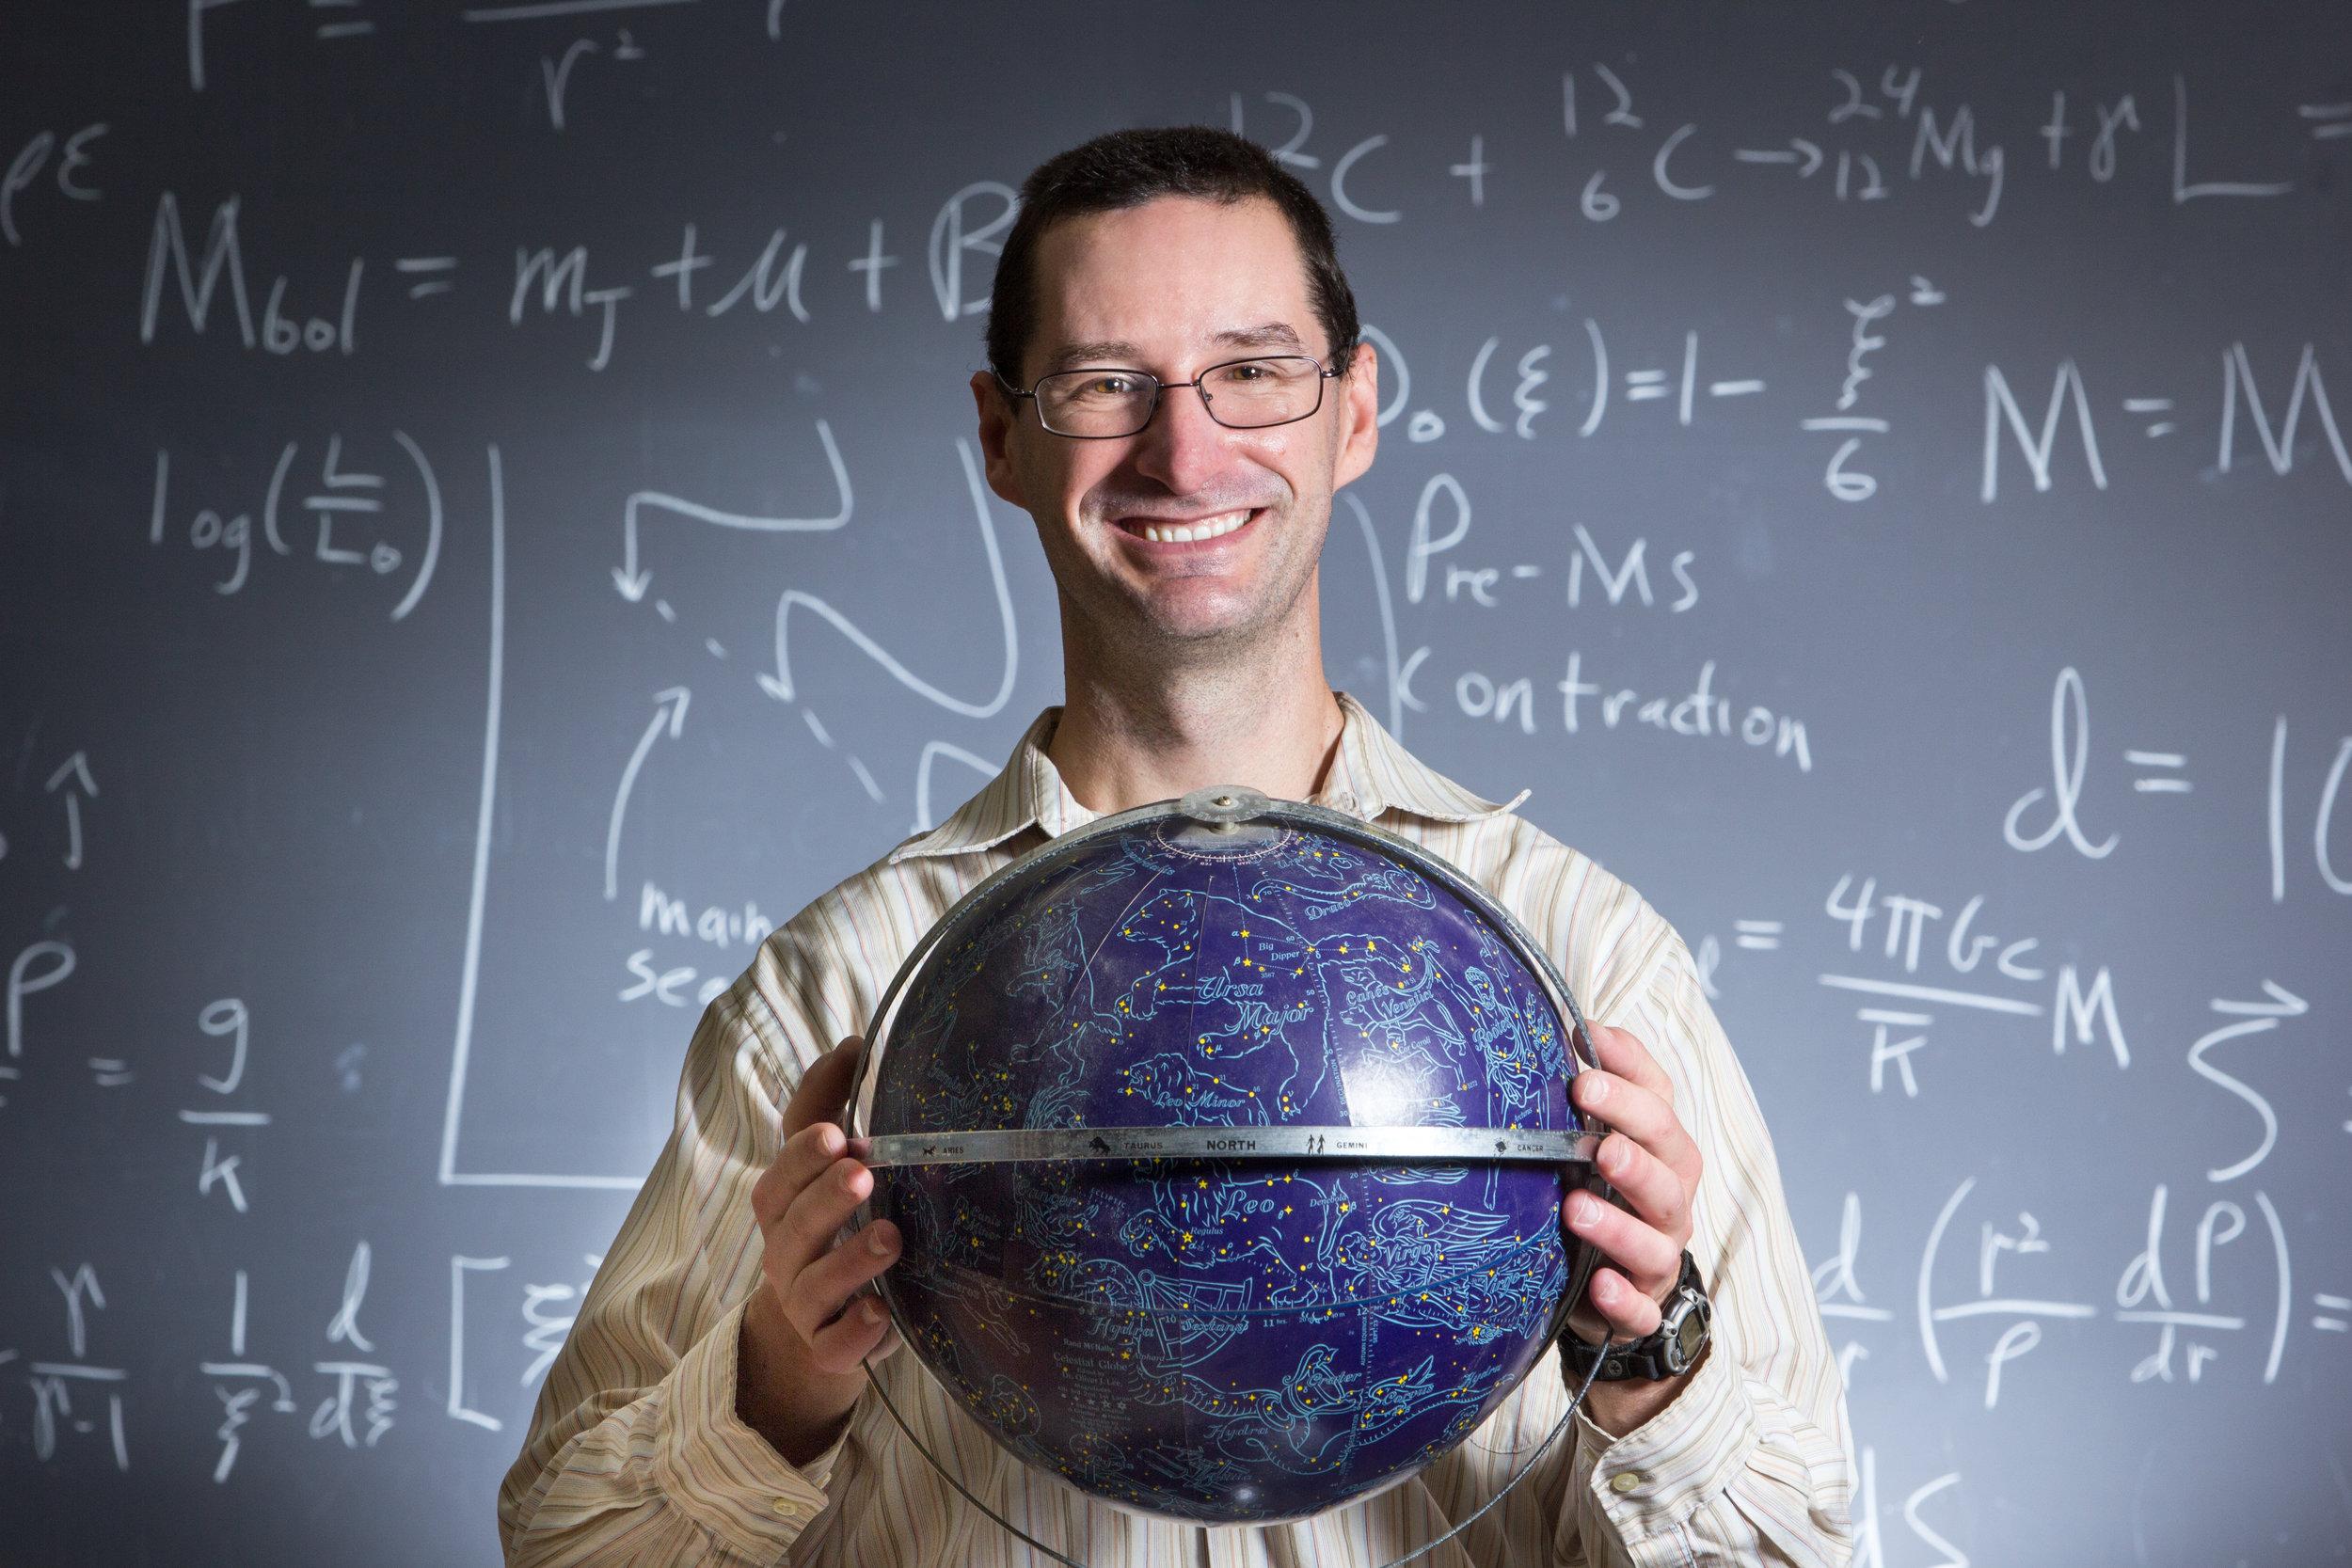 Mark Pecaut, Ph.D. (Photo by Rockhurst University)